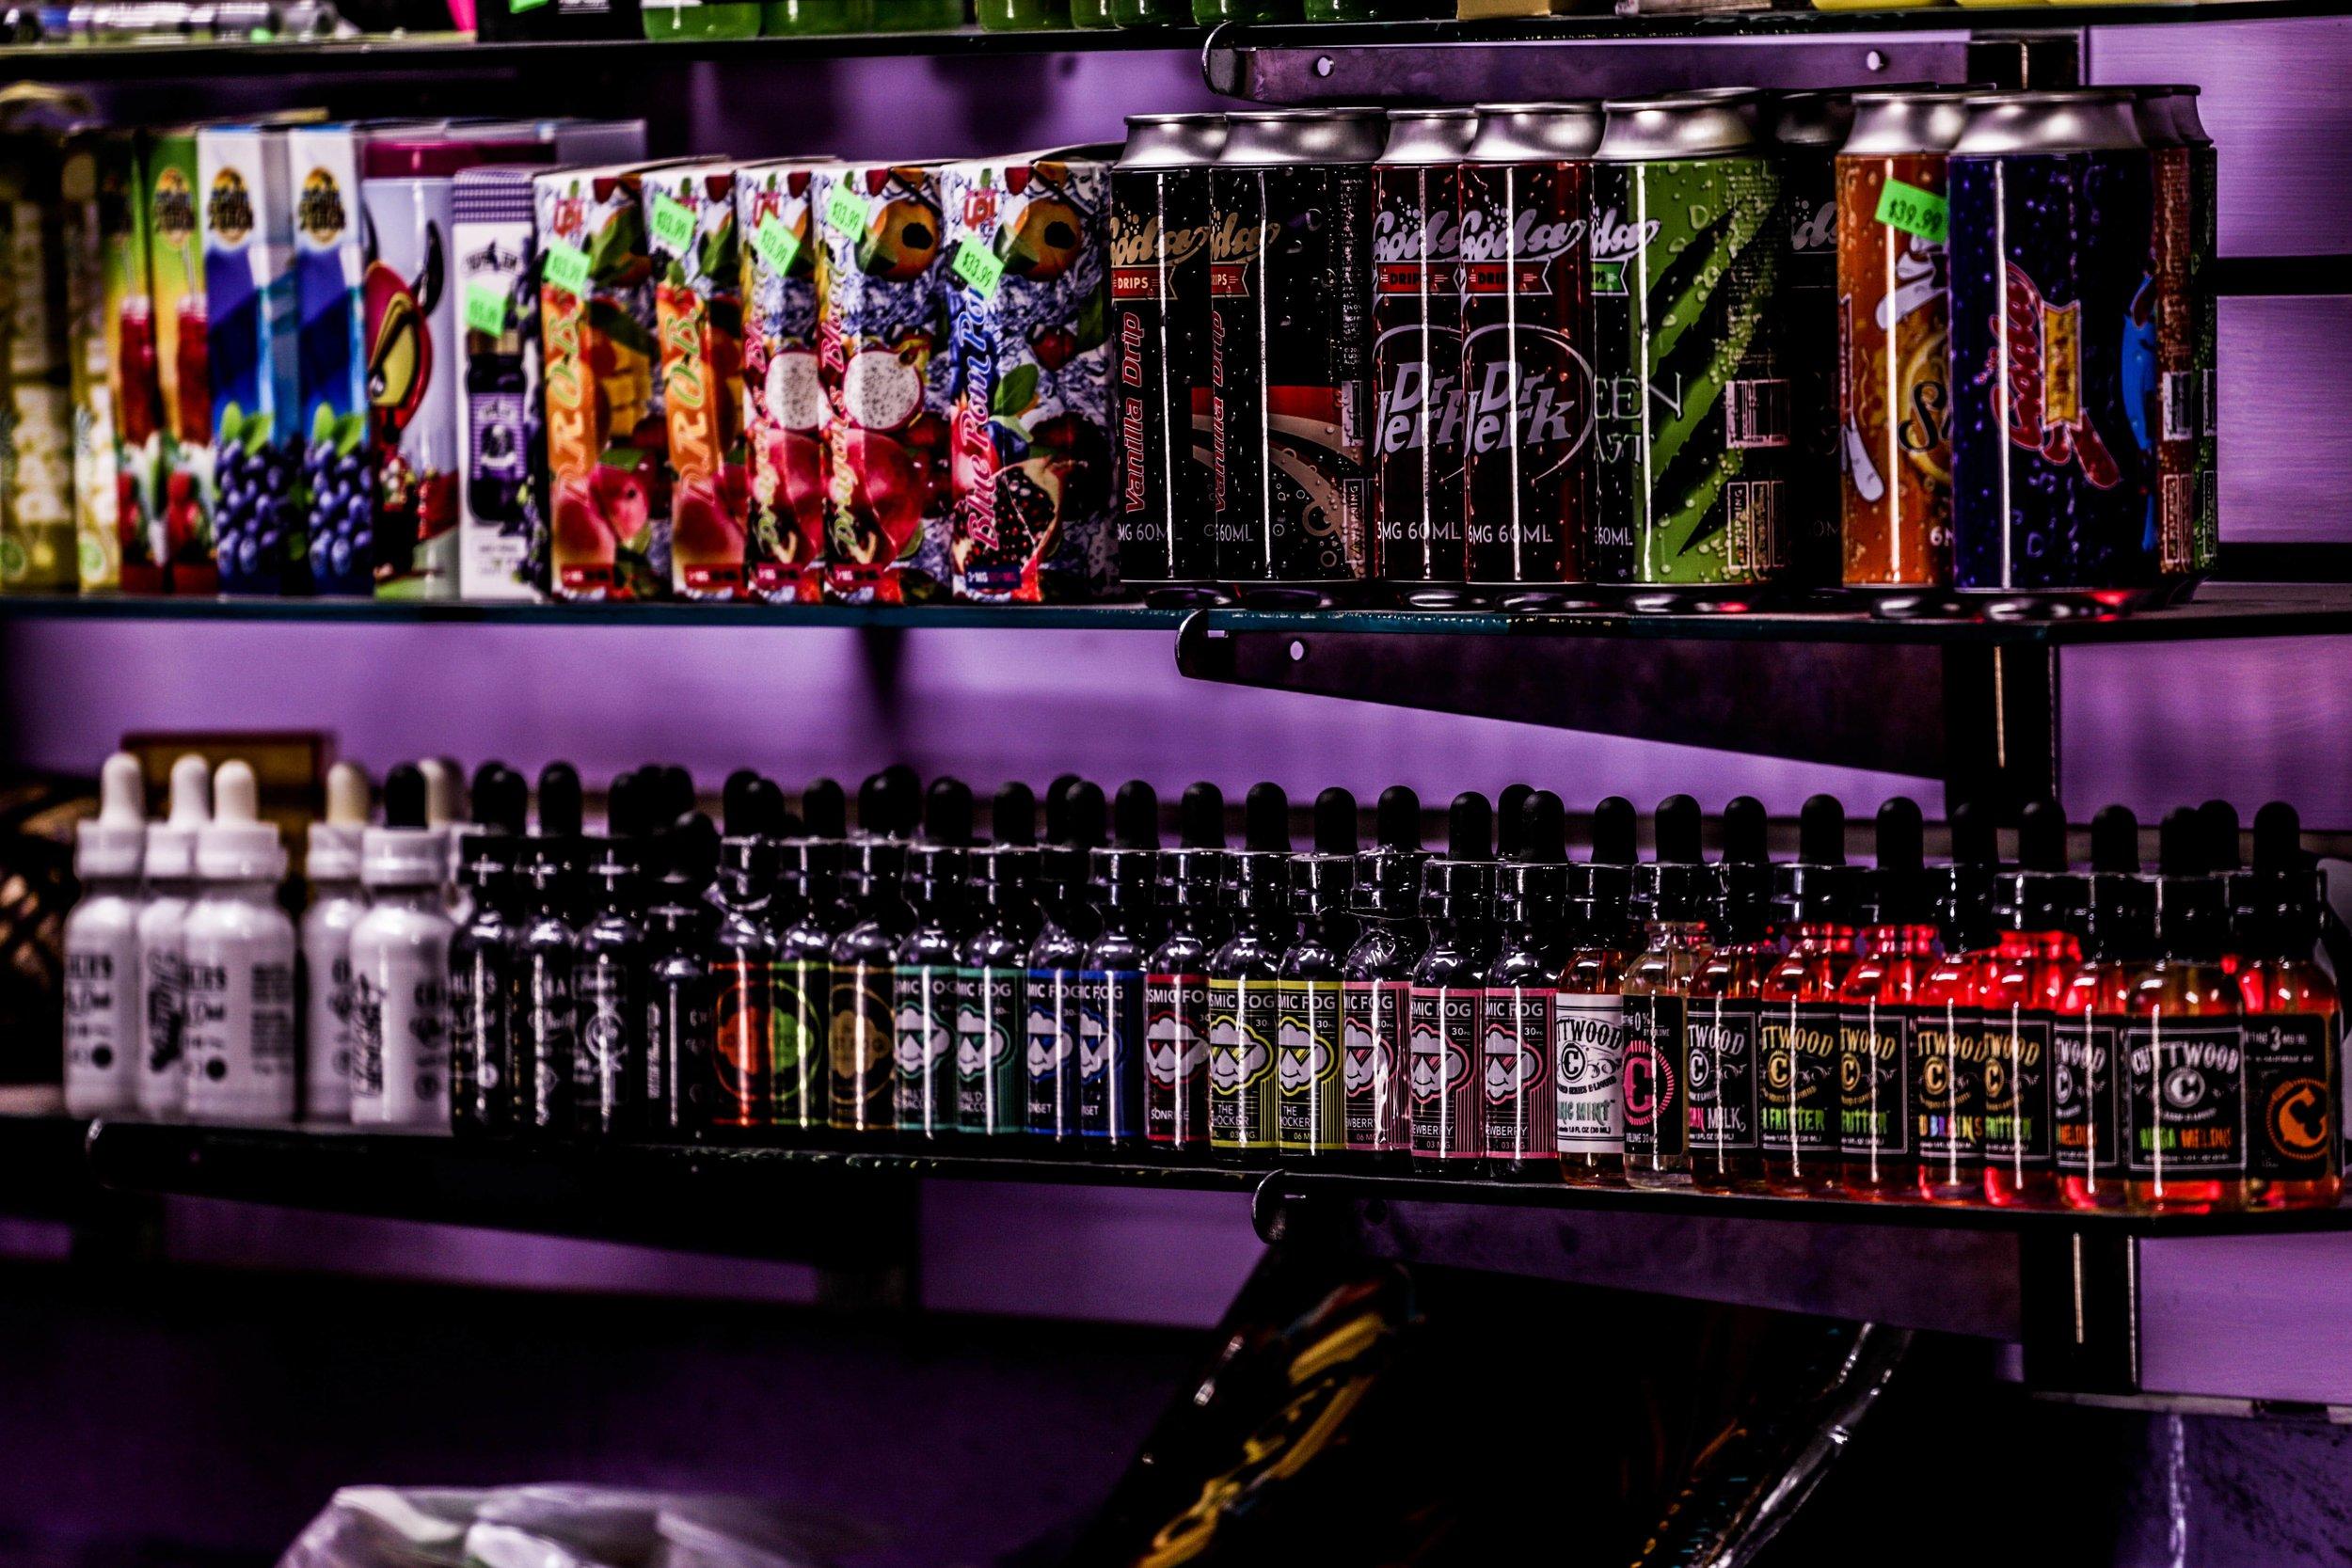 Premium E-Juice - Charlies Vape, Cosmic Fog, Cuttwood, Soda Drips, Space Jams, Prophet